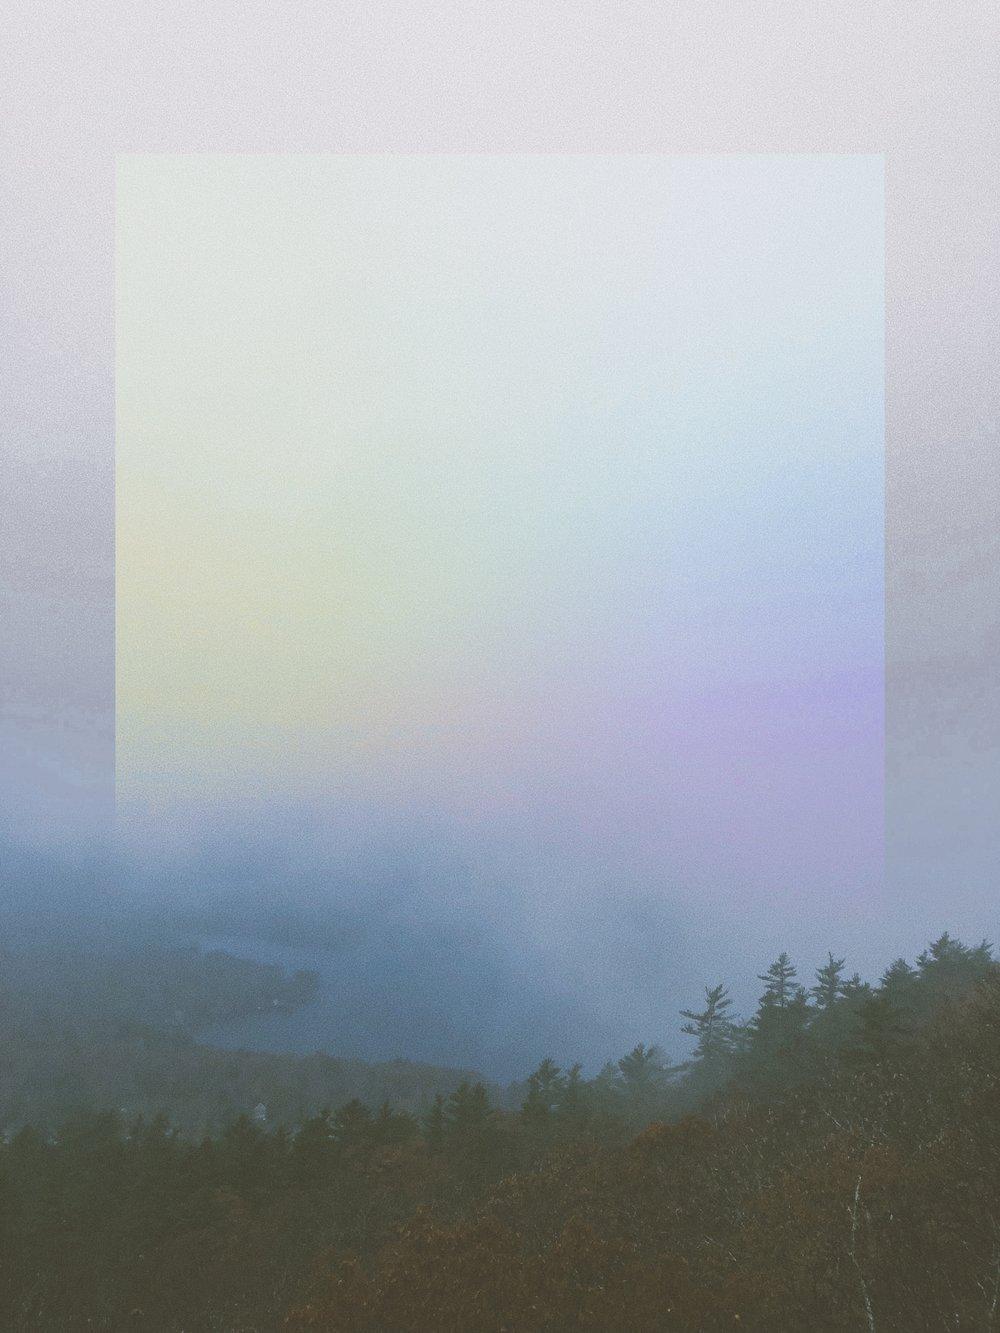 jlaurence-gltch-2018-007.JPG